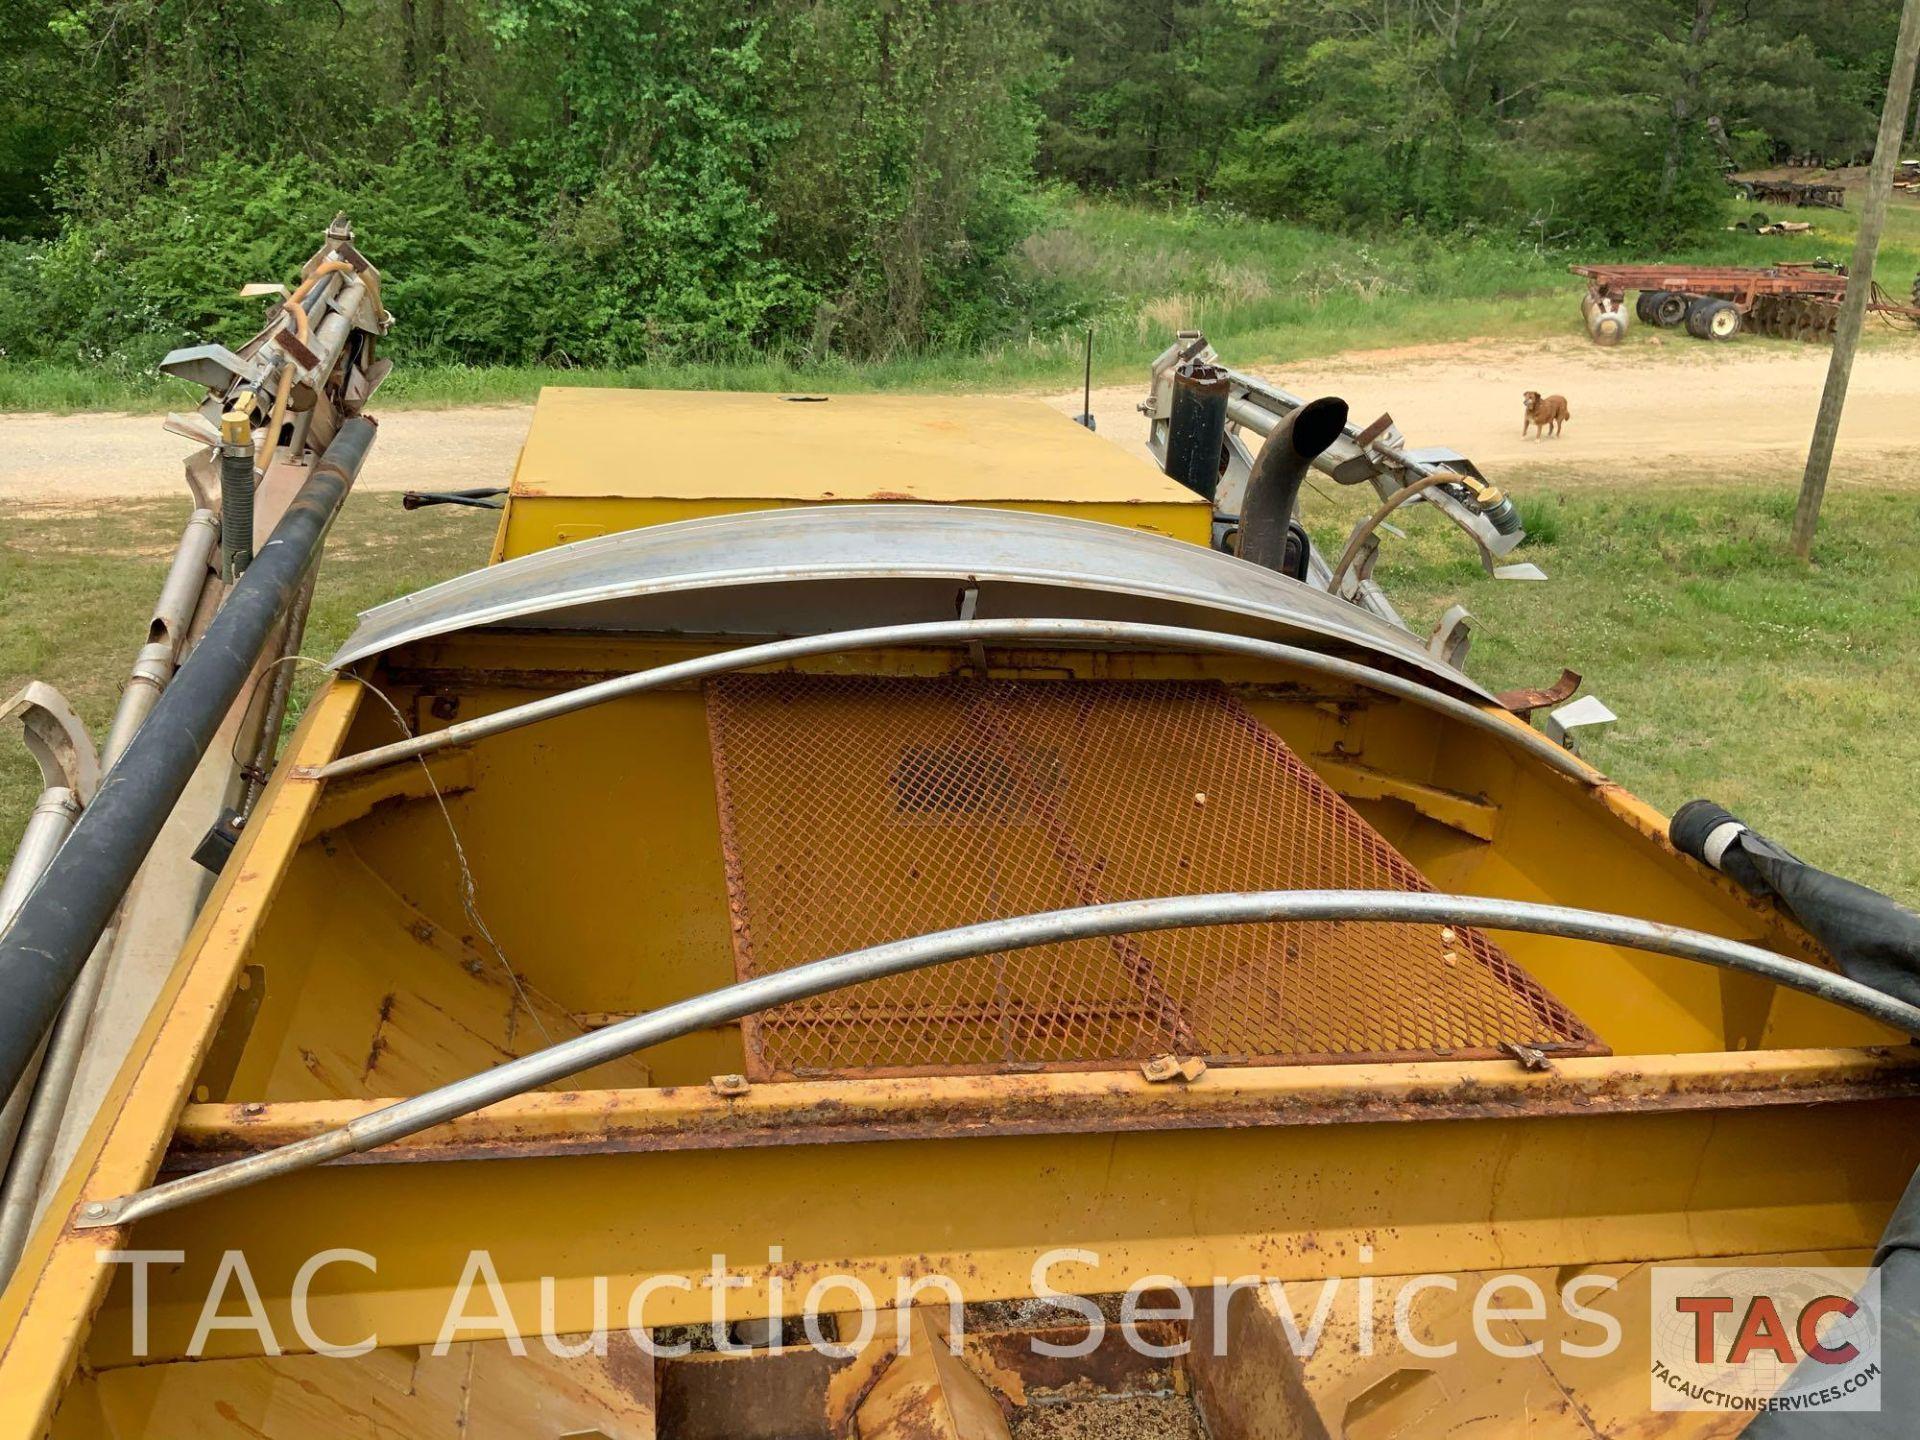 AirMax 1000 Dry Fertilizer Spreader - Image 27 of 30